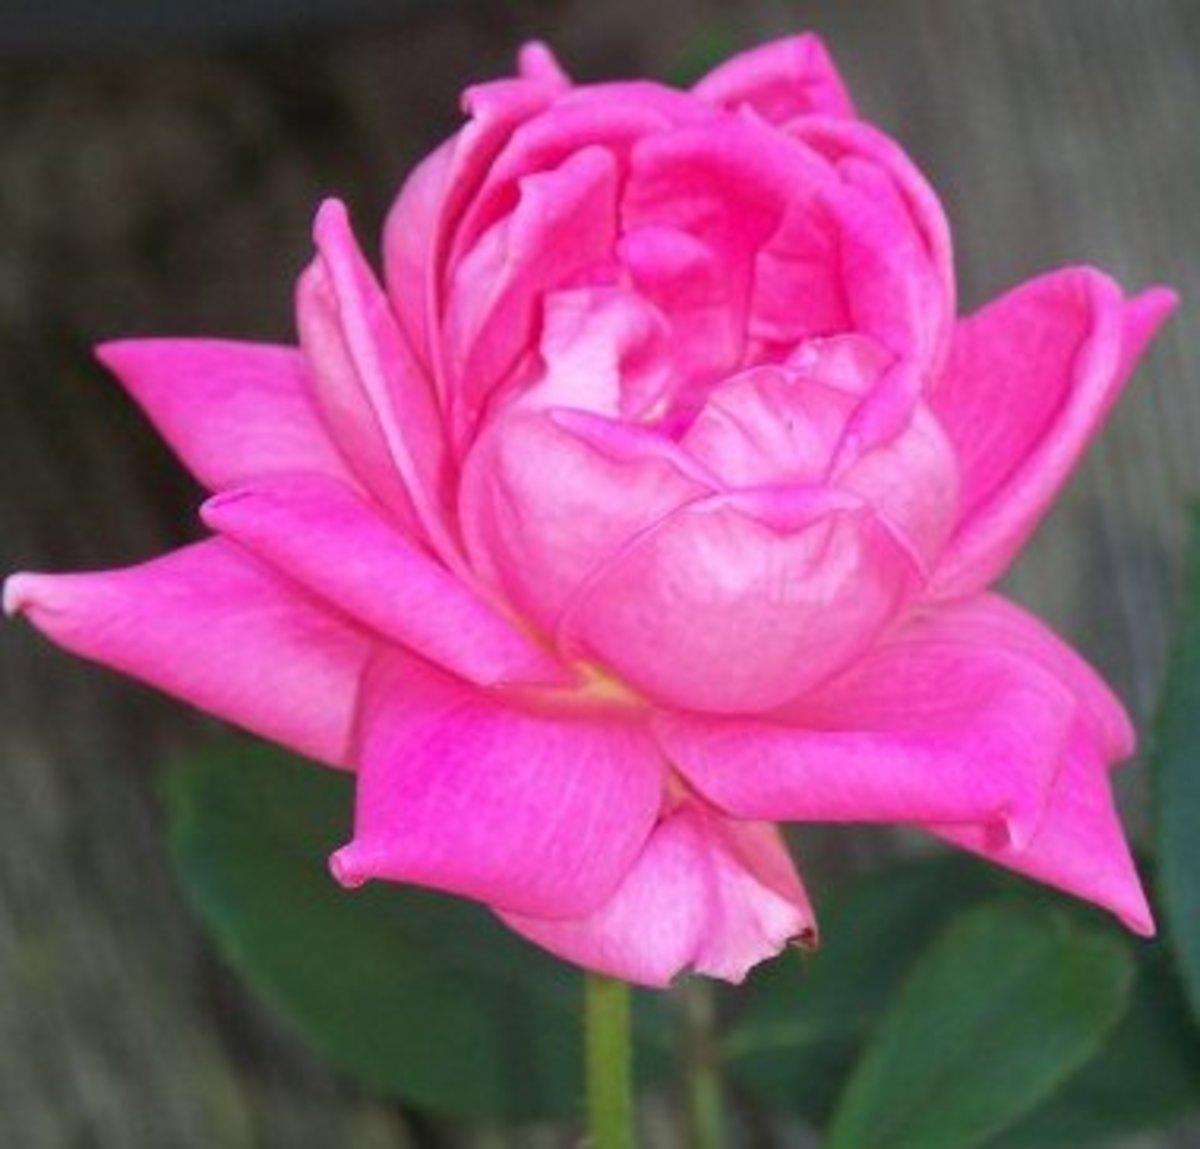 A Poem For Grandma. Grandma's Rose Garden, Haiku